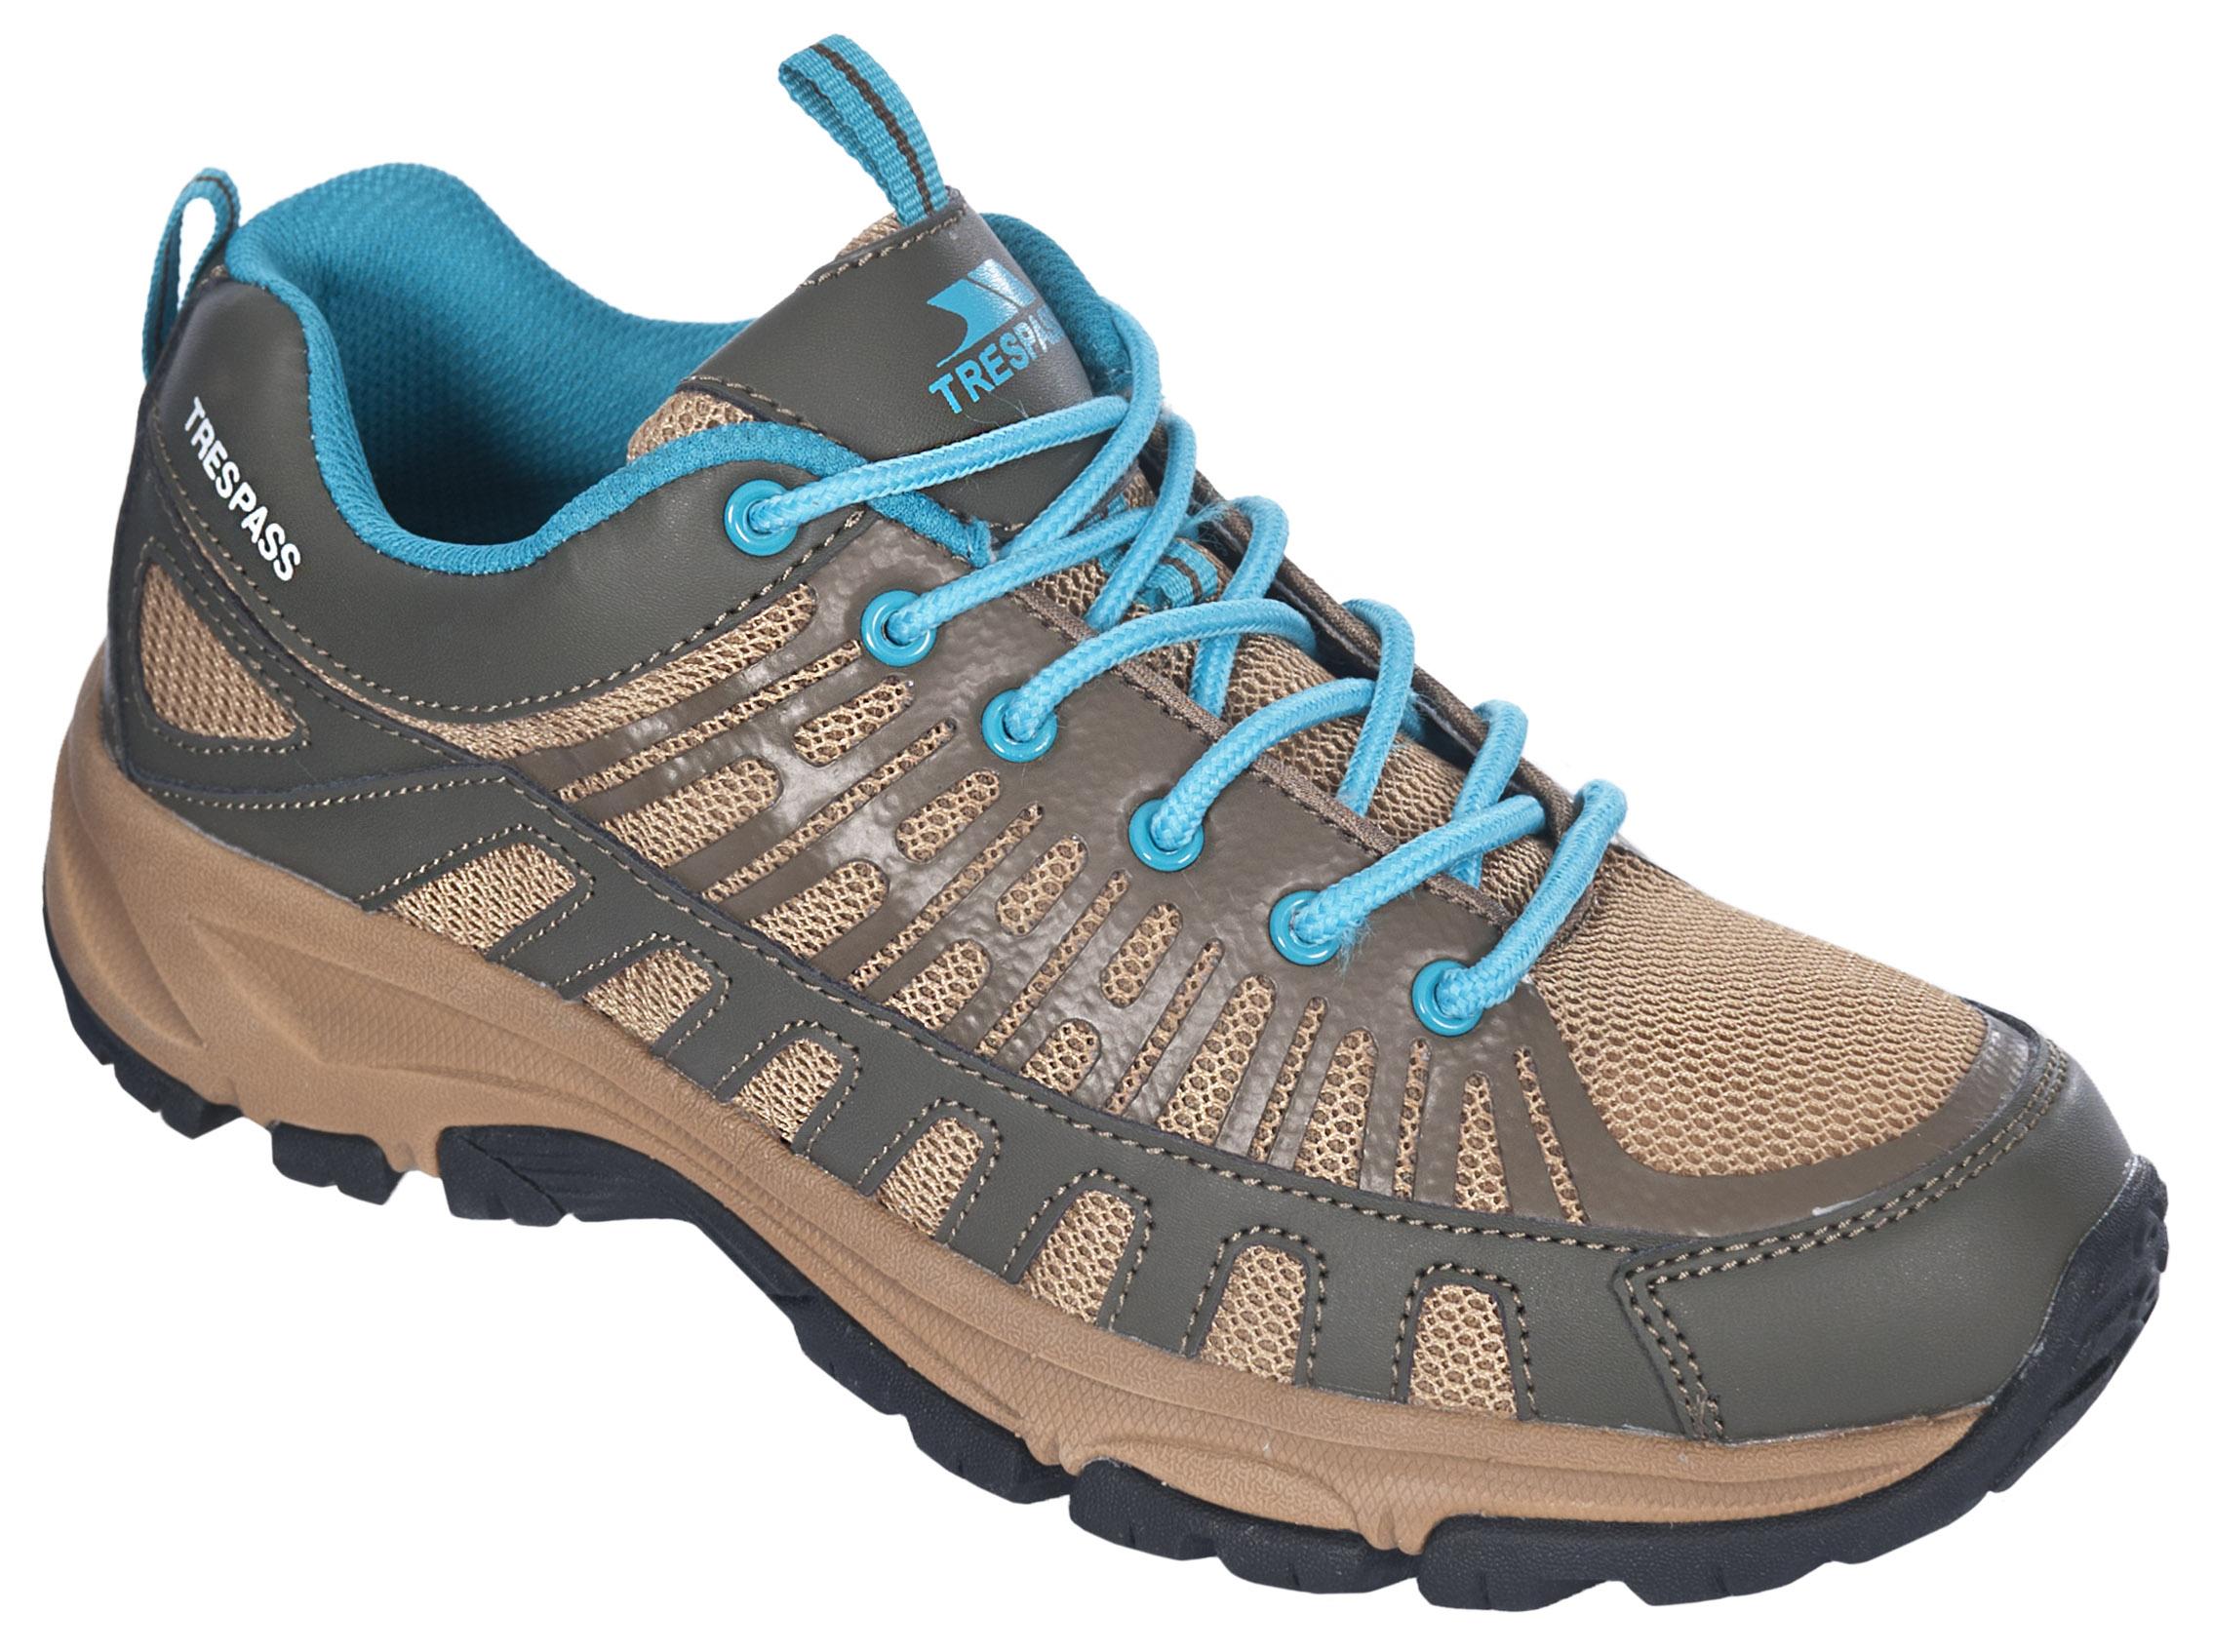 Pantofi femei Lane bark Trespass